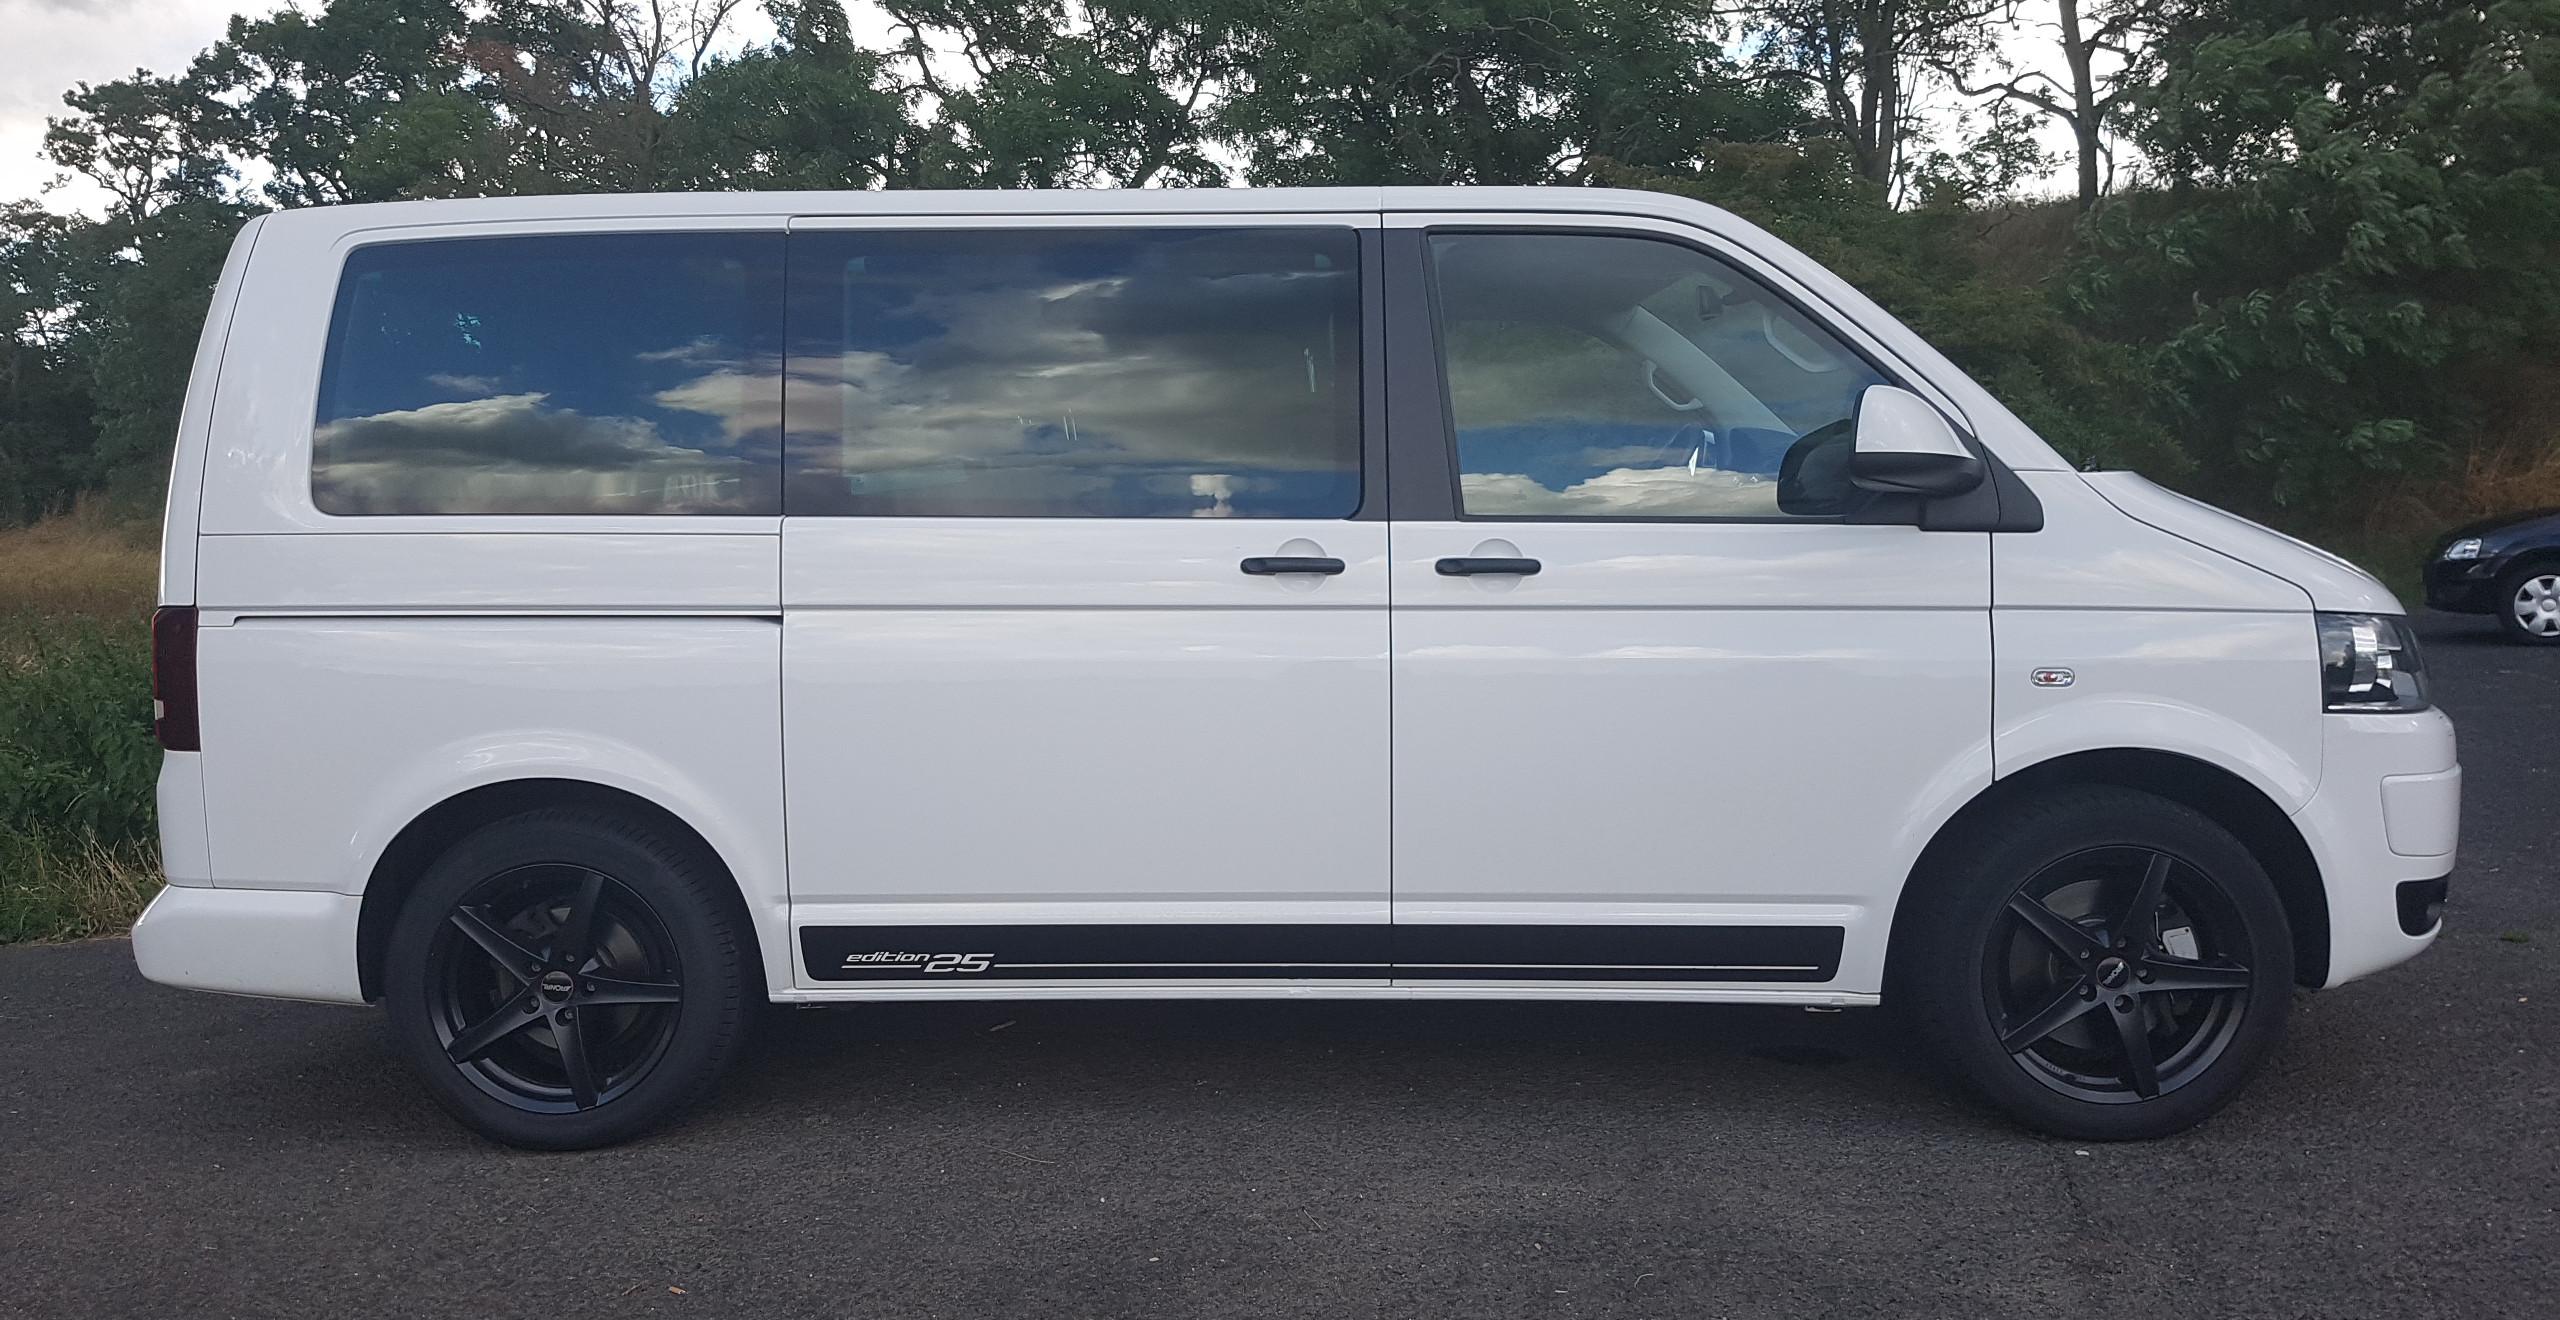 Import Auto Allemagne - Auto Convoi Allemagne - Volkswagen T5 Multivan Edition 25 2.0 TDI 179ch